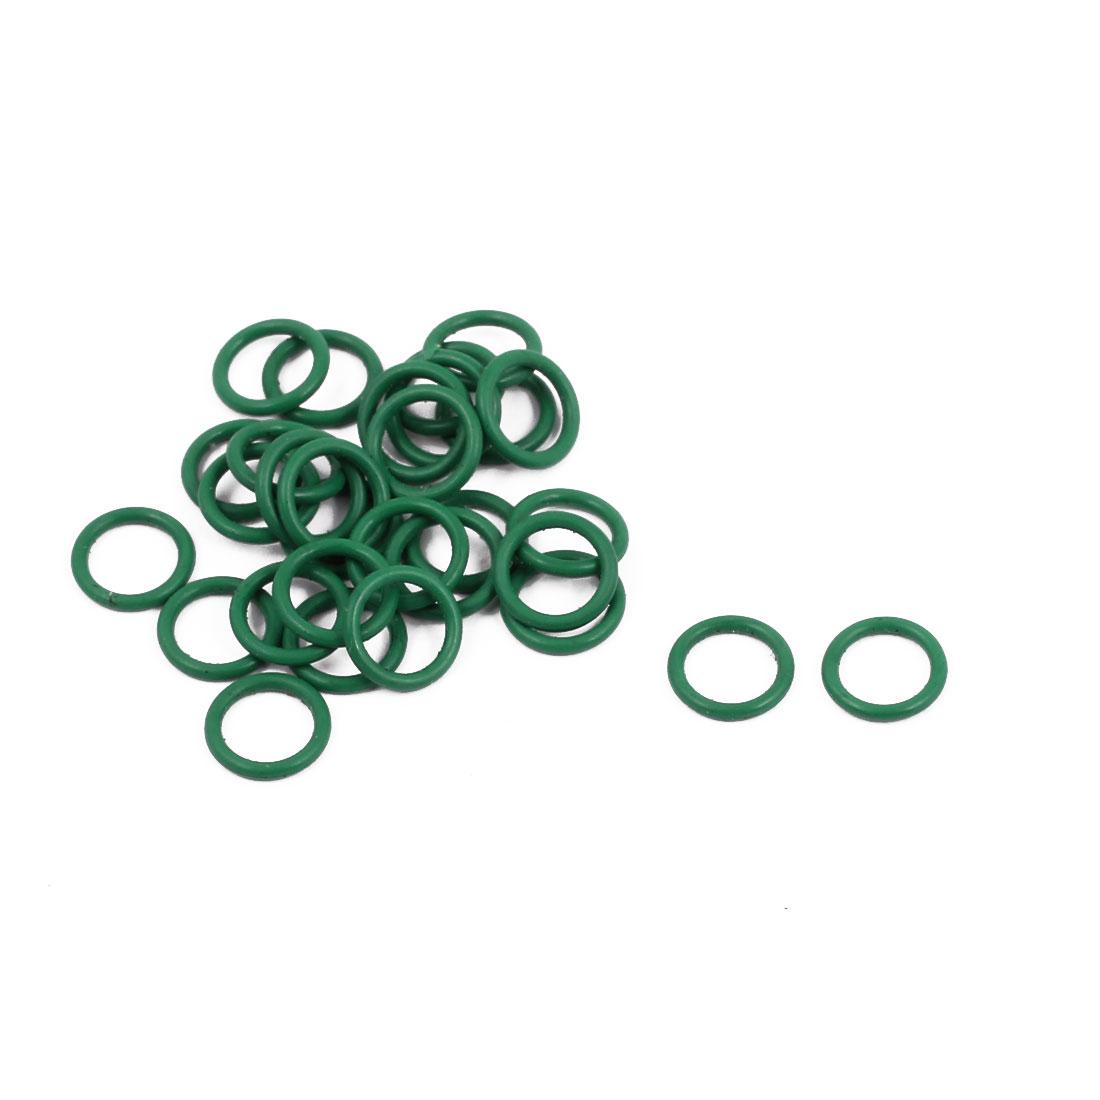 30Pcs 7mm x 1mm FKM O-rings Heat Resistant Sealing Ring Grommets Green